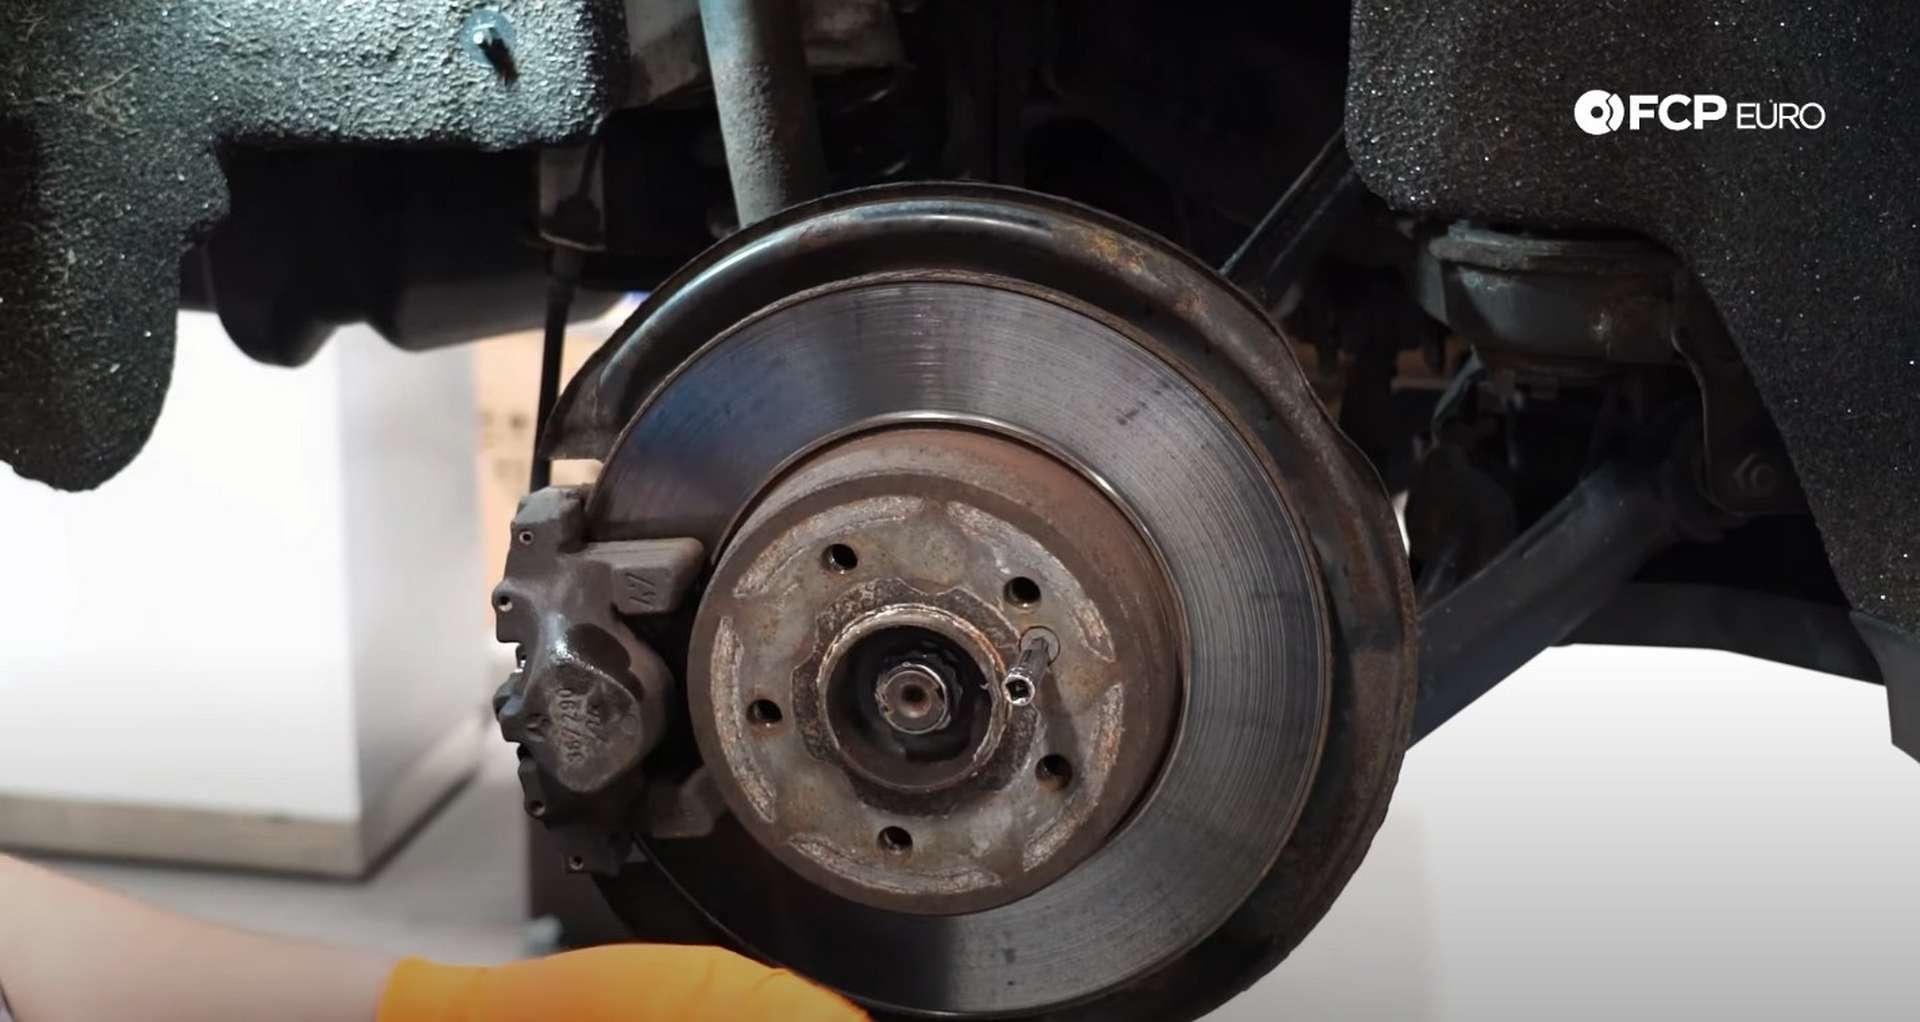 02-DIY-Mercedes-W203-Rear-Brake-Service_Removing-Caliper